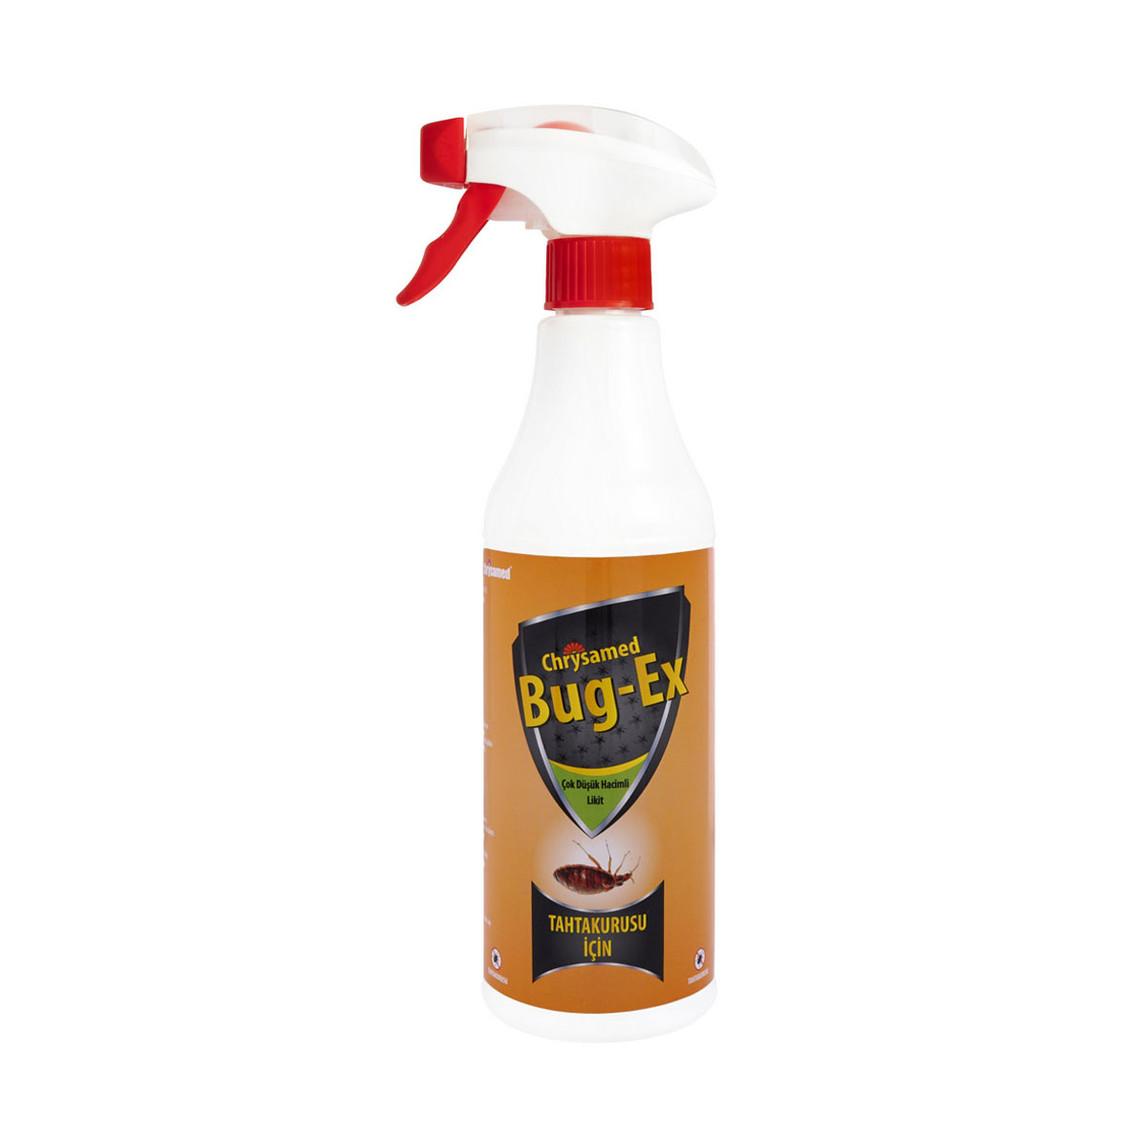 Chrysamed BUG-EX (Tahta Kurusu İçin)-500 ml